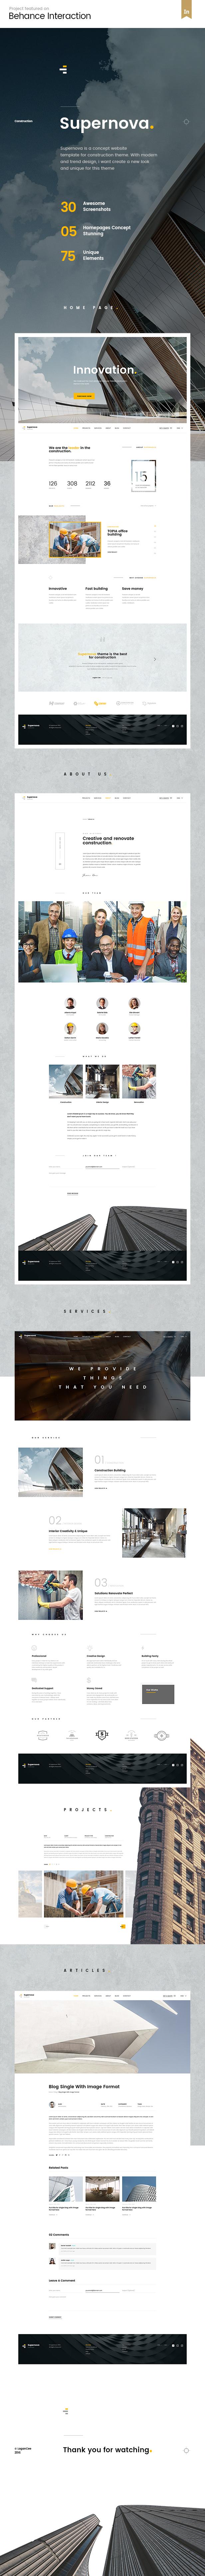 Supernova | Mutil-Concept Construction PSD Template - 4